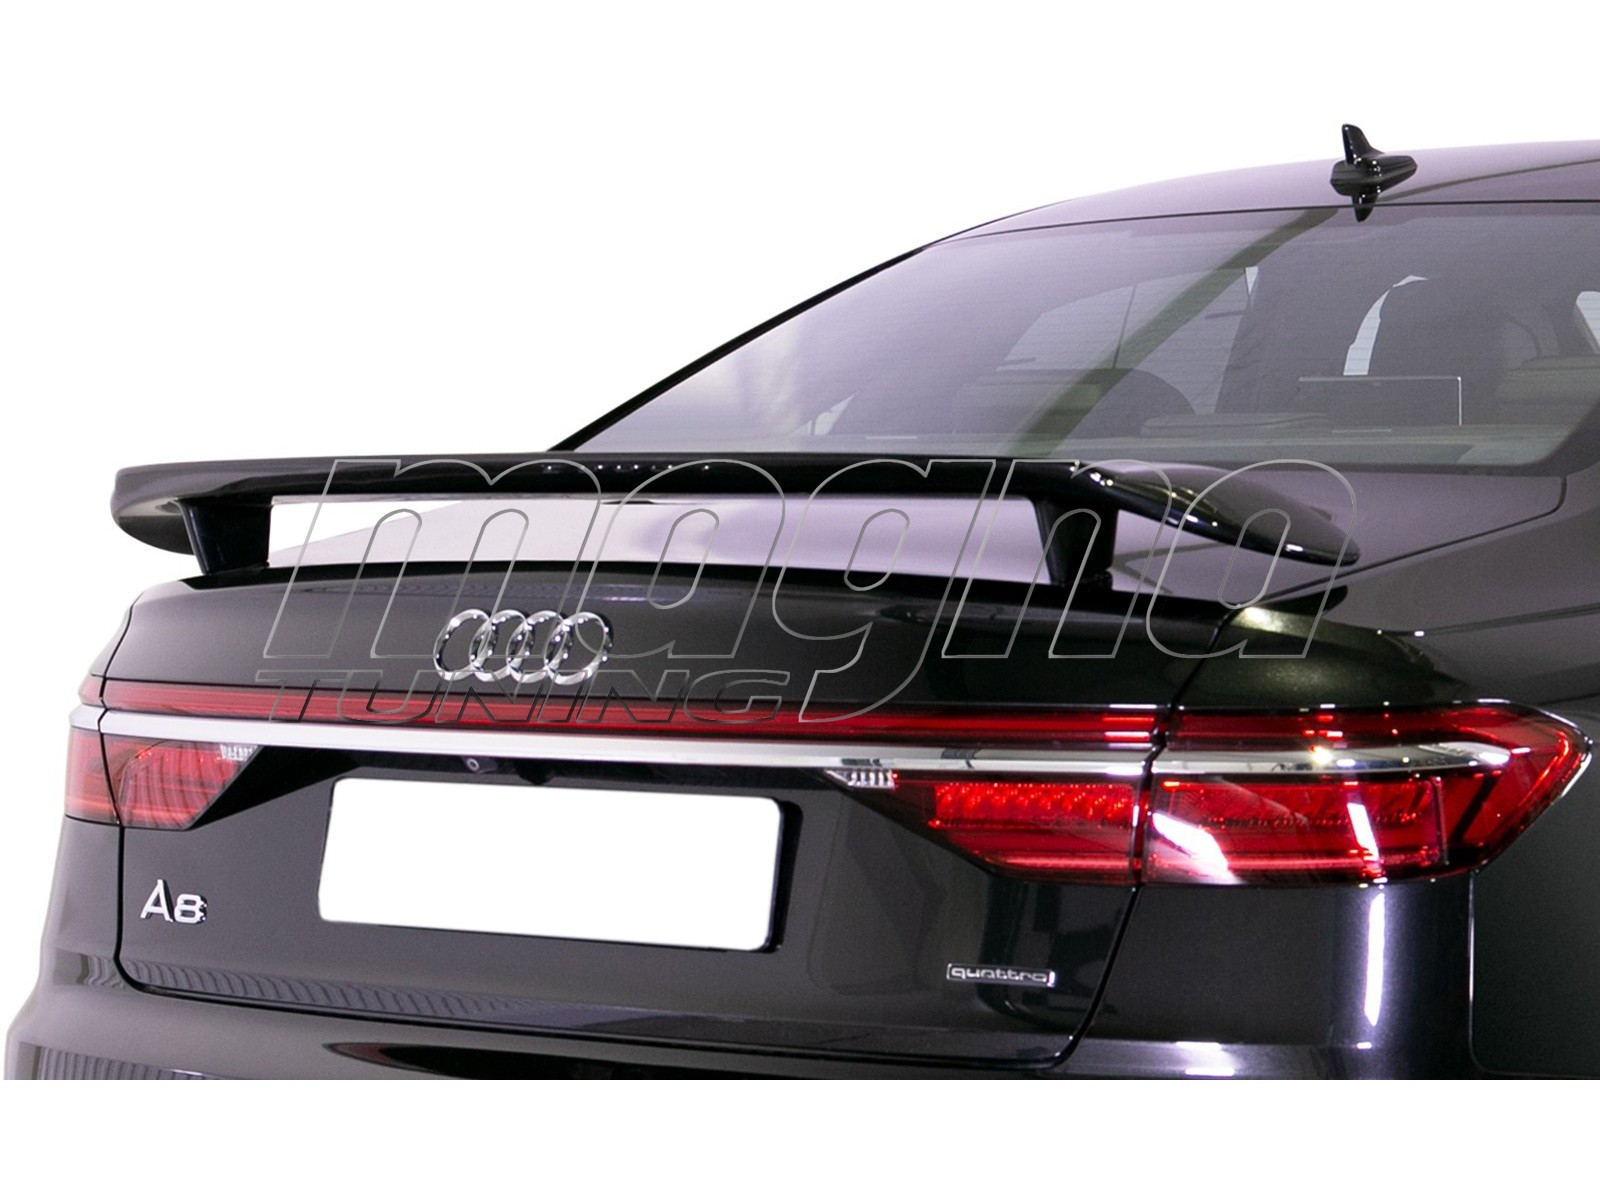 Audi A8 / S8 D5 / 4N RX Rear Wing